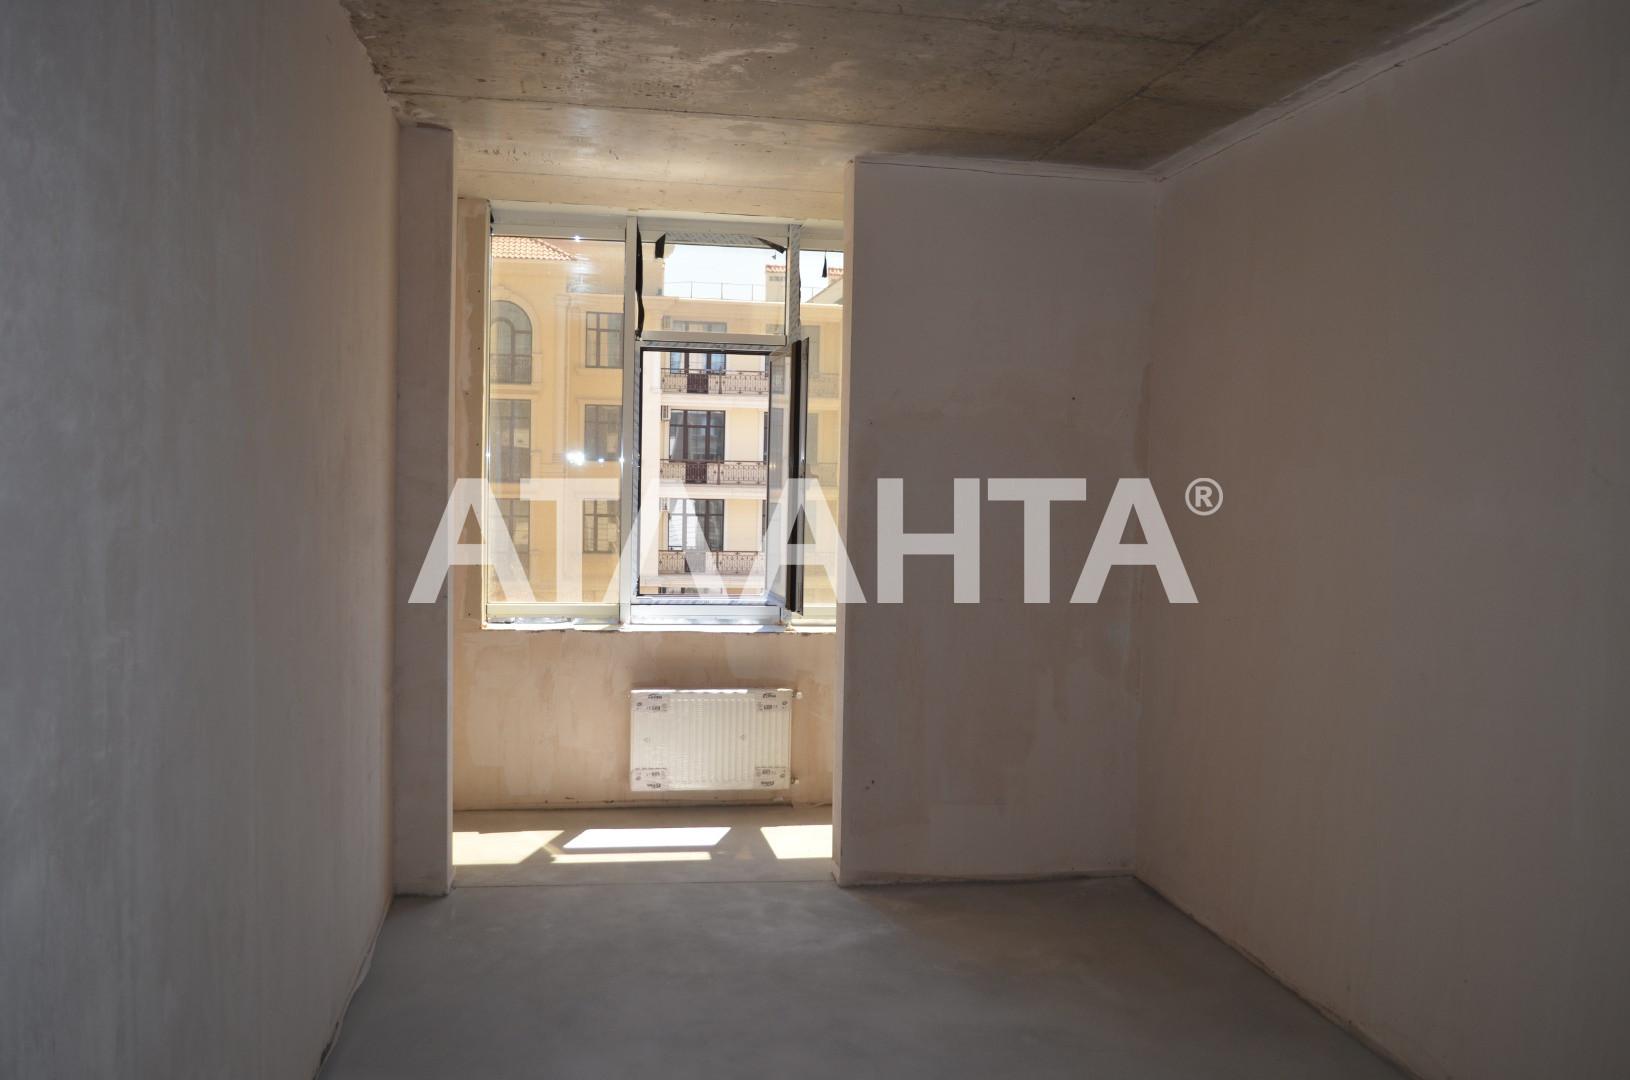 Продается 1-комнатная Квартира на ул. Французский Бул. (Пролетарский Бул.) — 49 900 у.е. (фото №3)